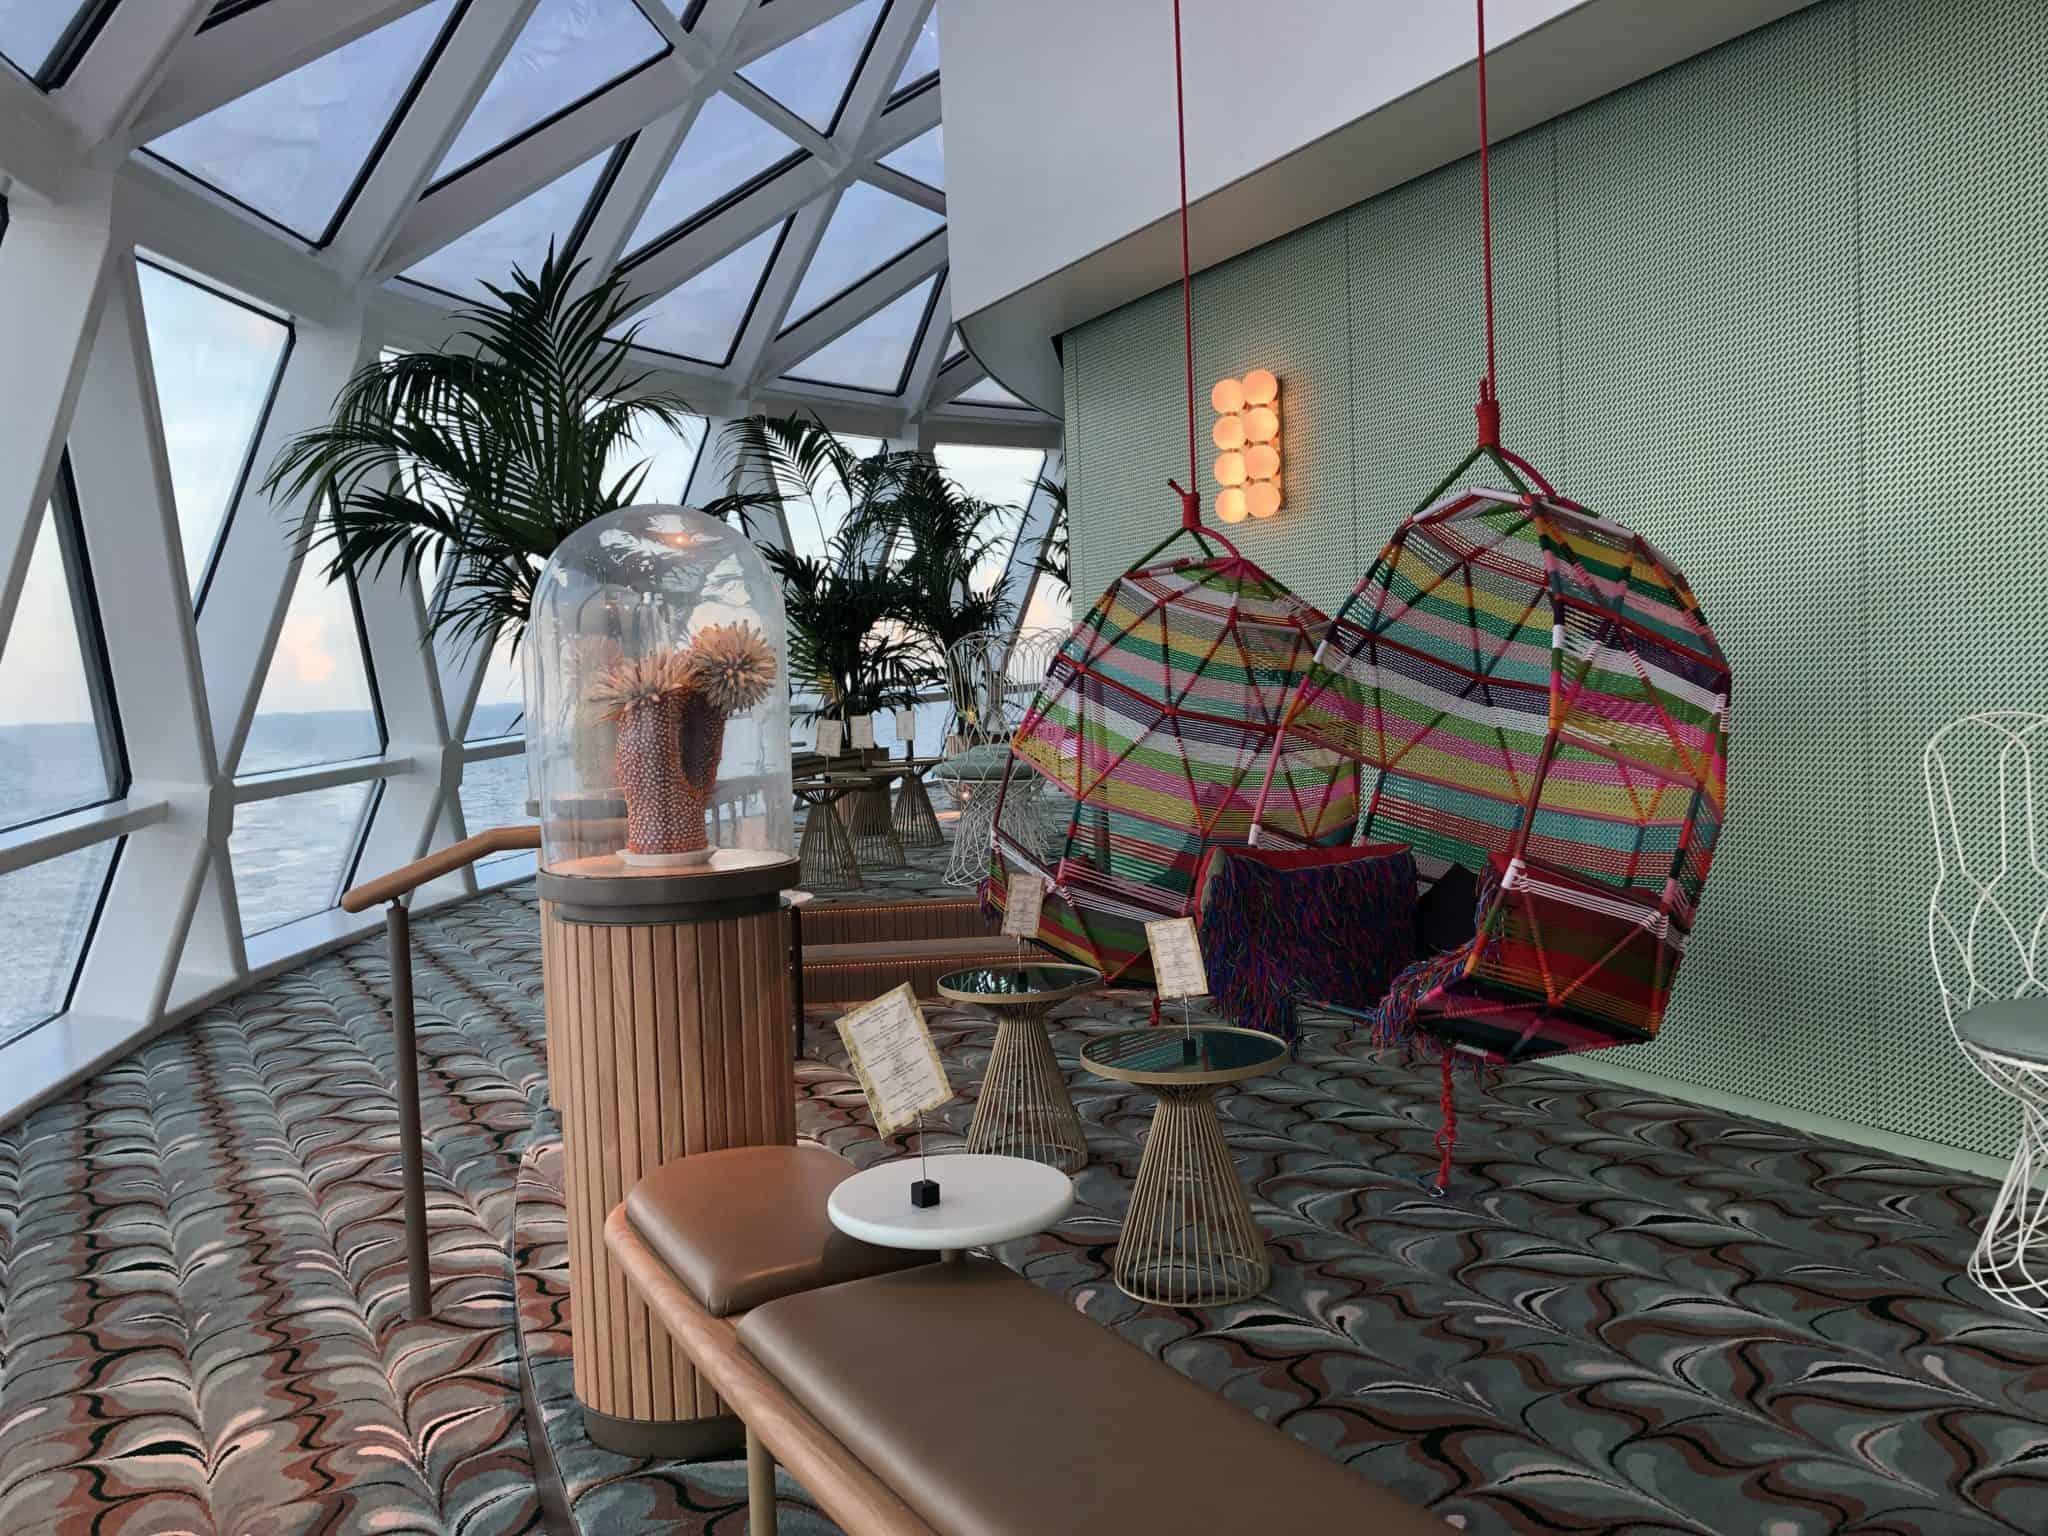 eden hanging chairs